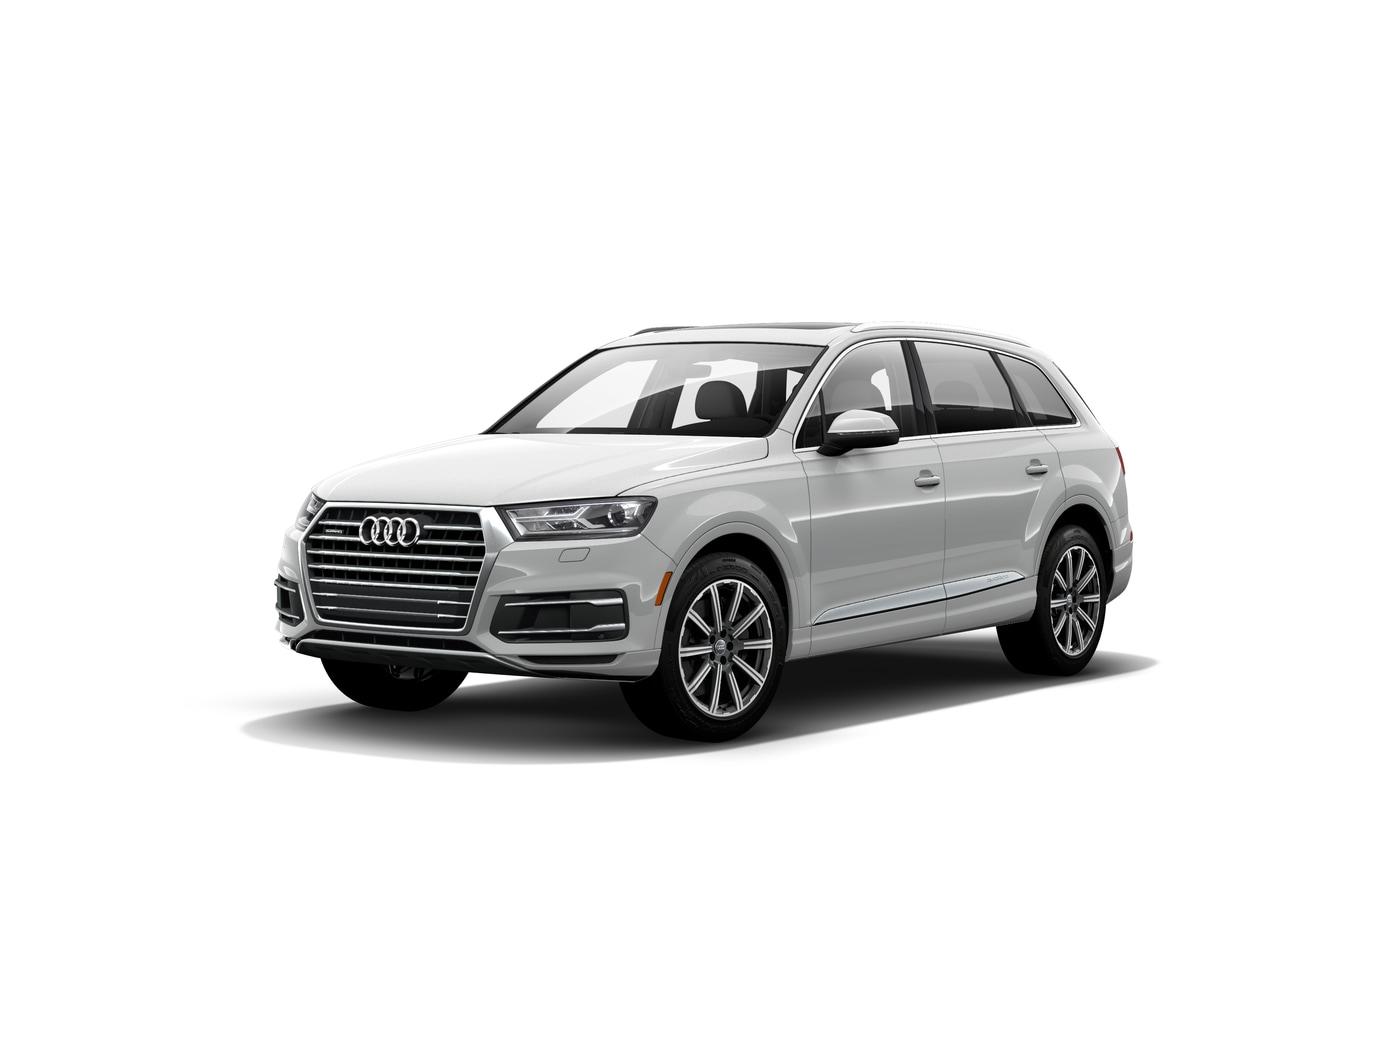 2019 Audi Q7 3.0 TFSI Premium